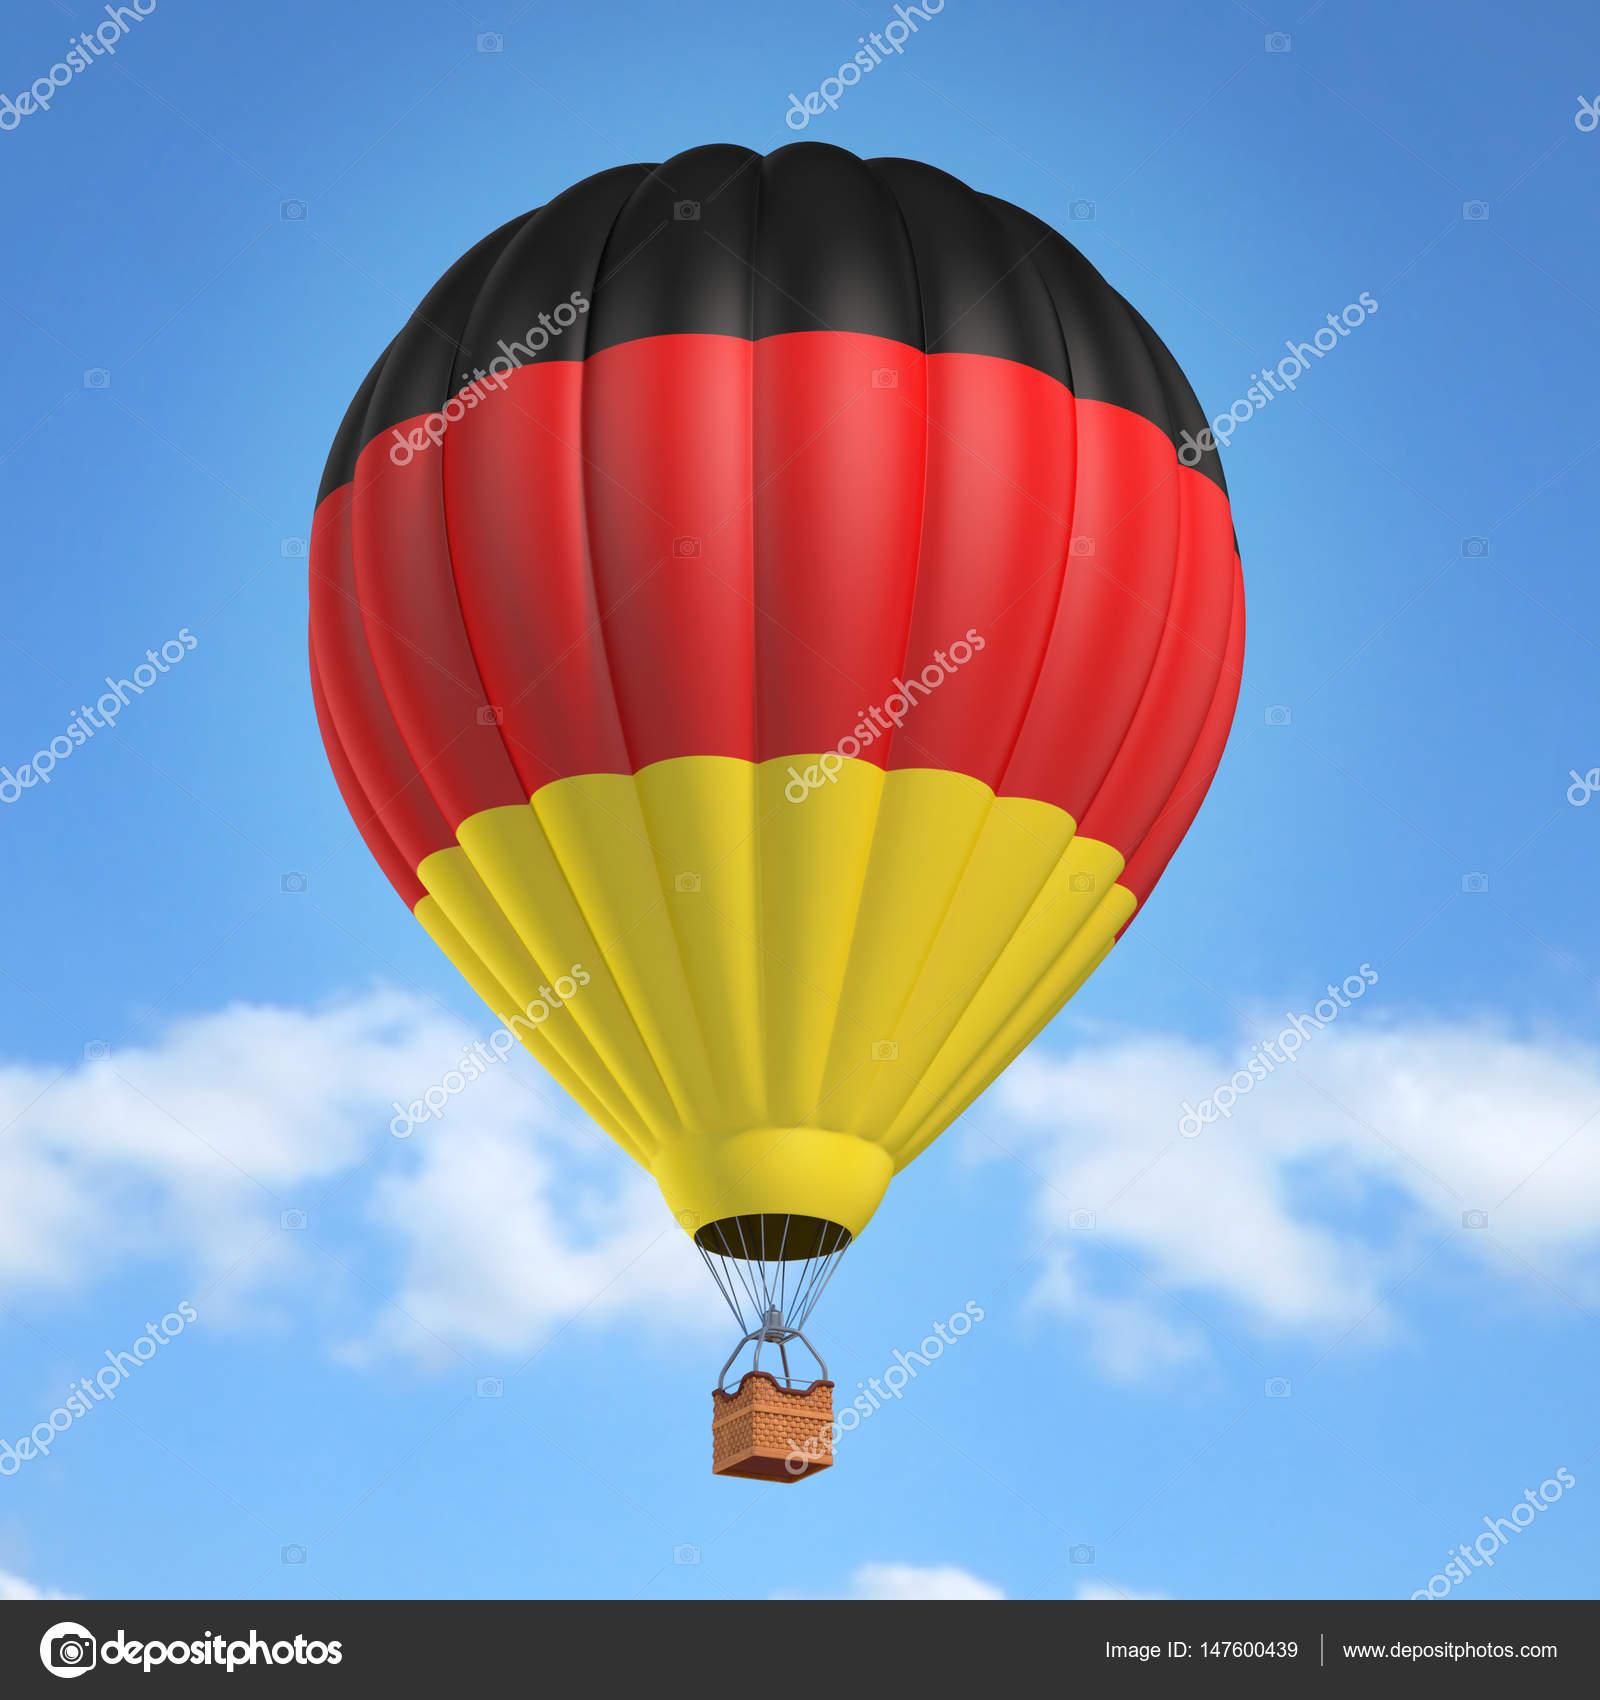 hei luftballon mit deutscher flagge stockfoto koya979 147600439. Black Bedroom Furniture Sets. Home Design Ideas